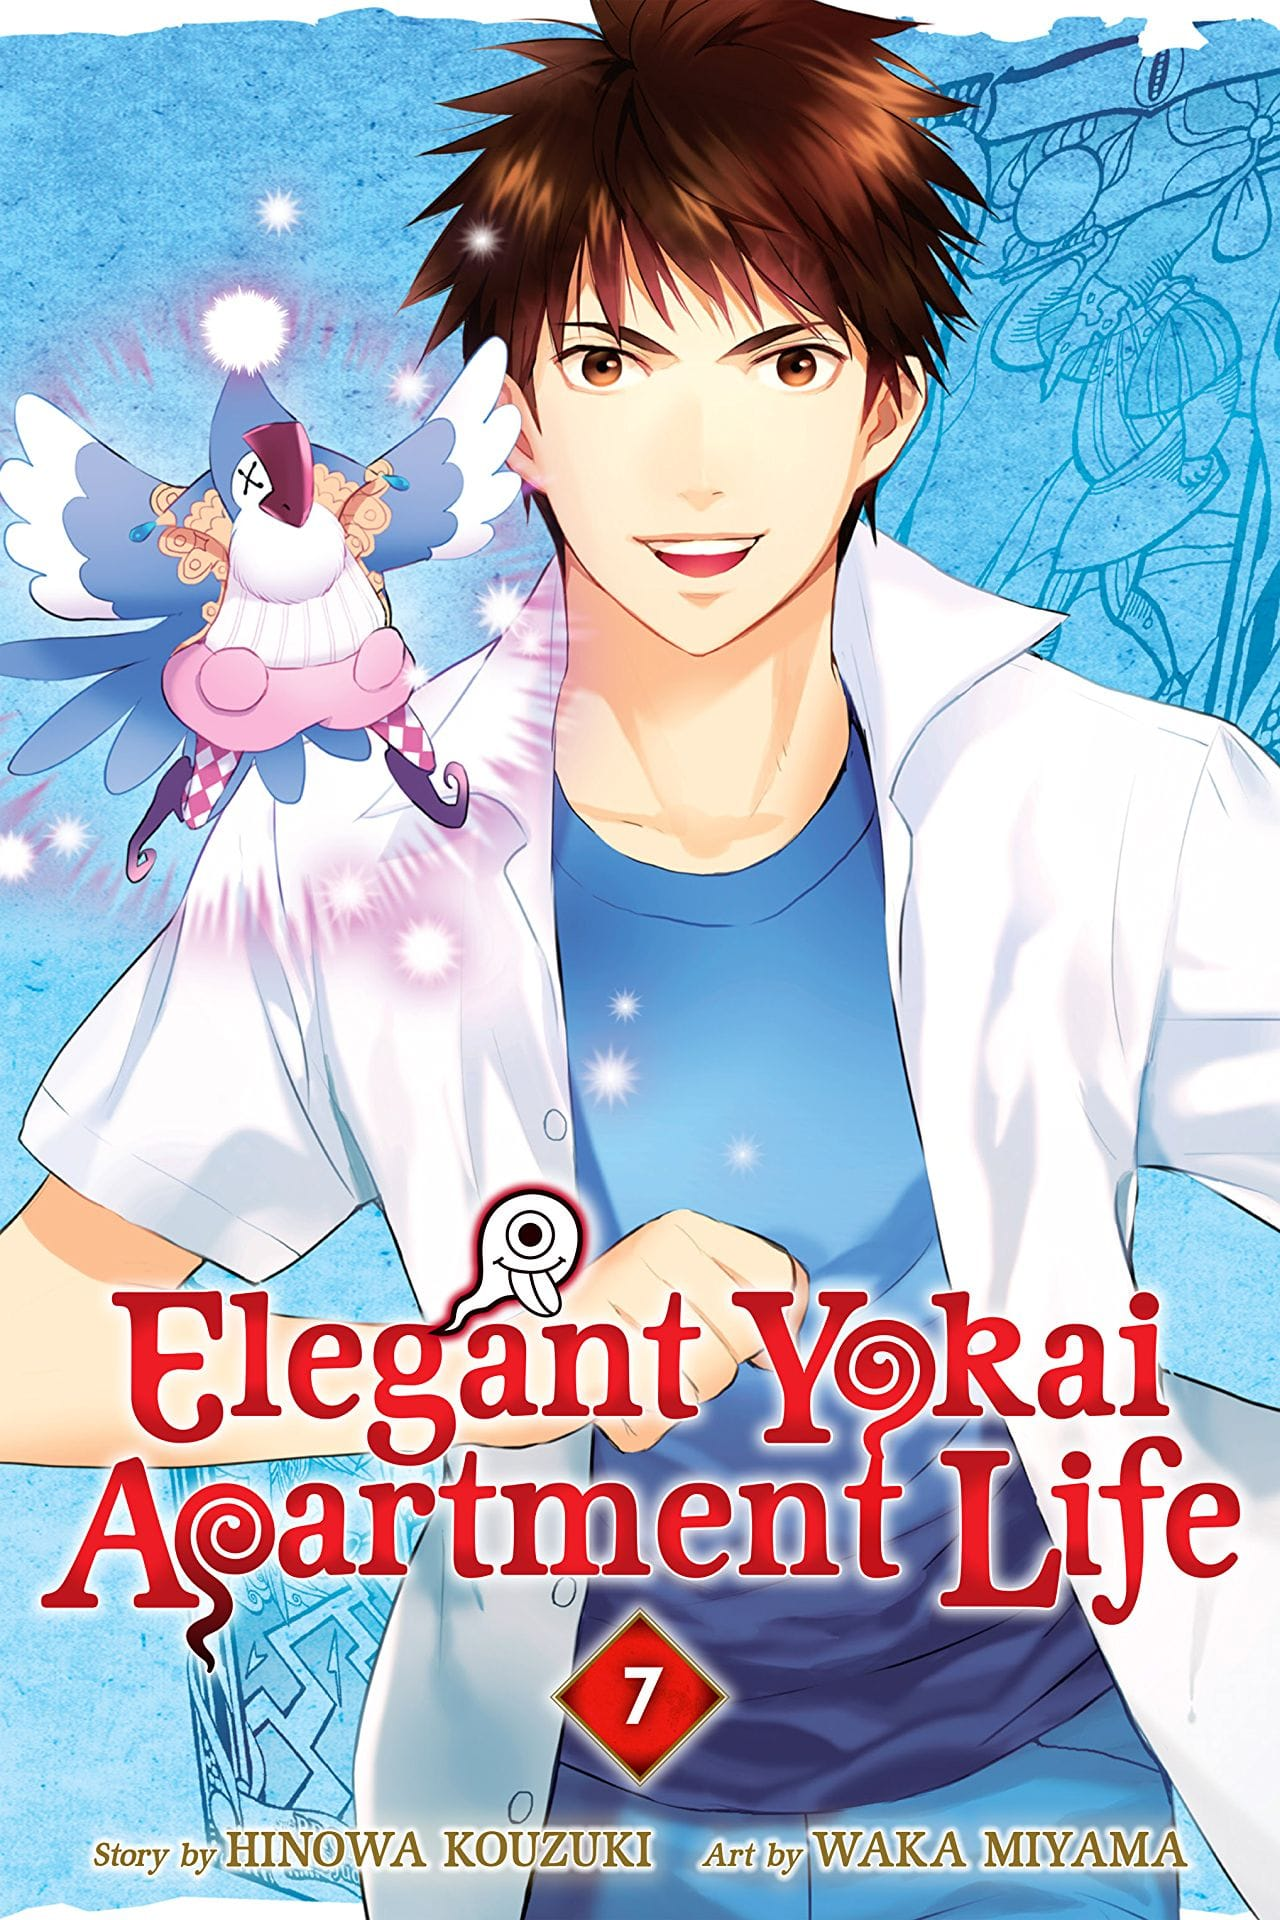 Elegant Yokai Apartment Life Vol. 7 Review